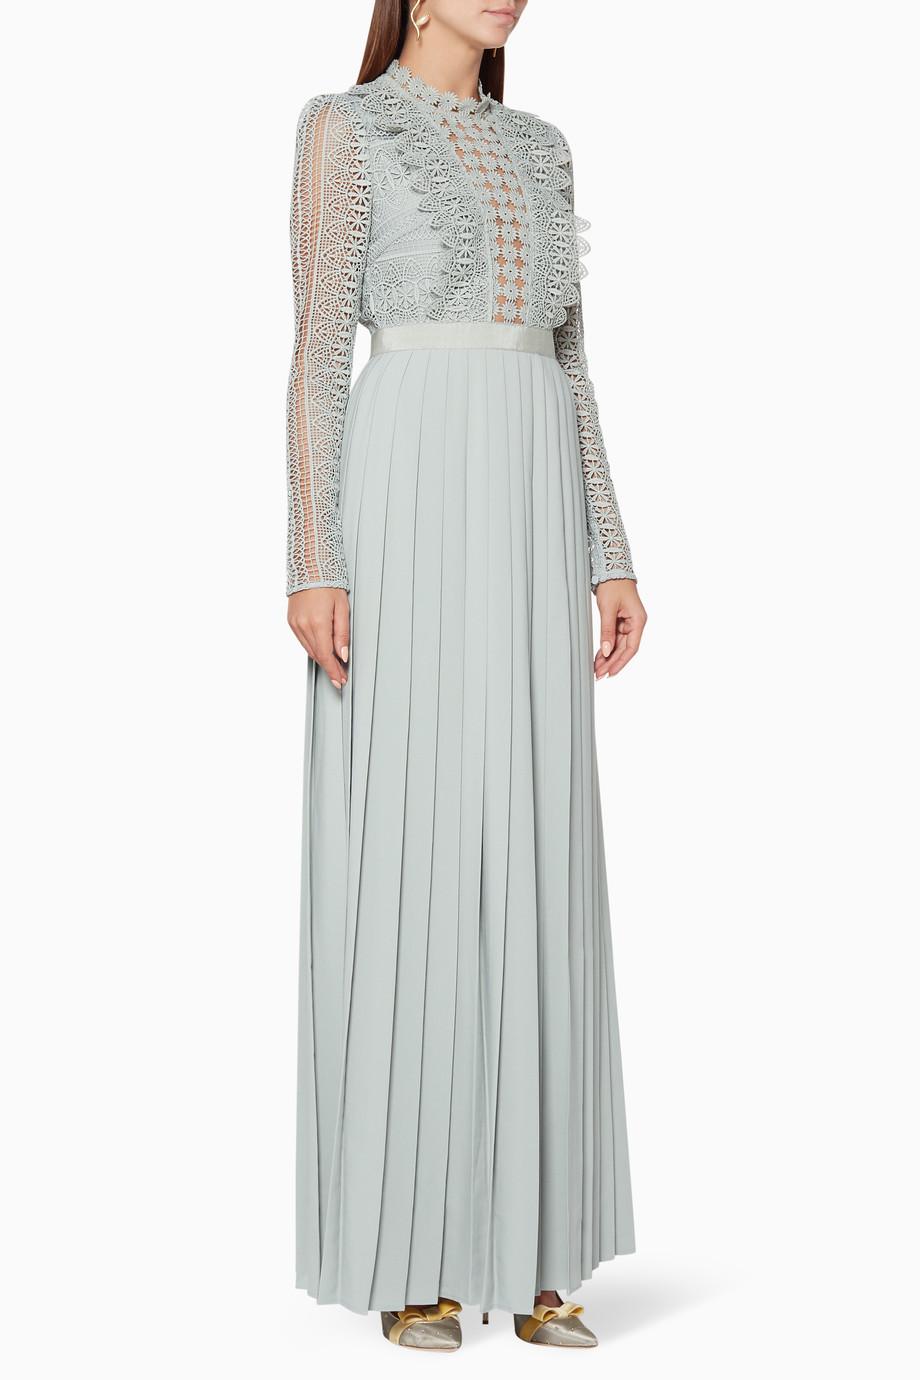 b7184243288 Shop Self-Portrait Blue Grey-Blue Spiral Lace Maxi Dress for Women ...